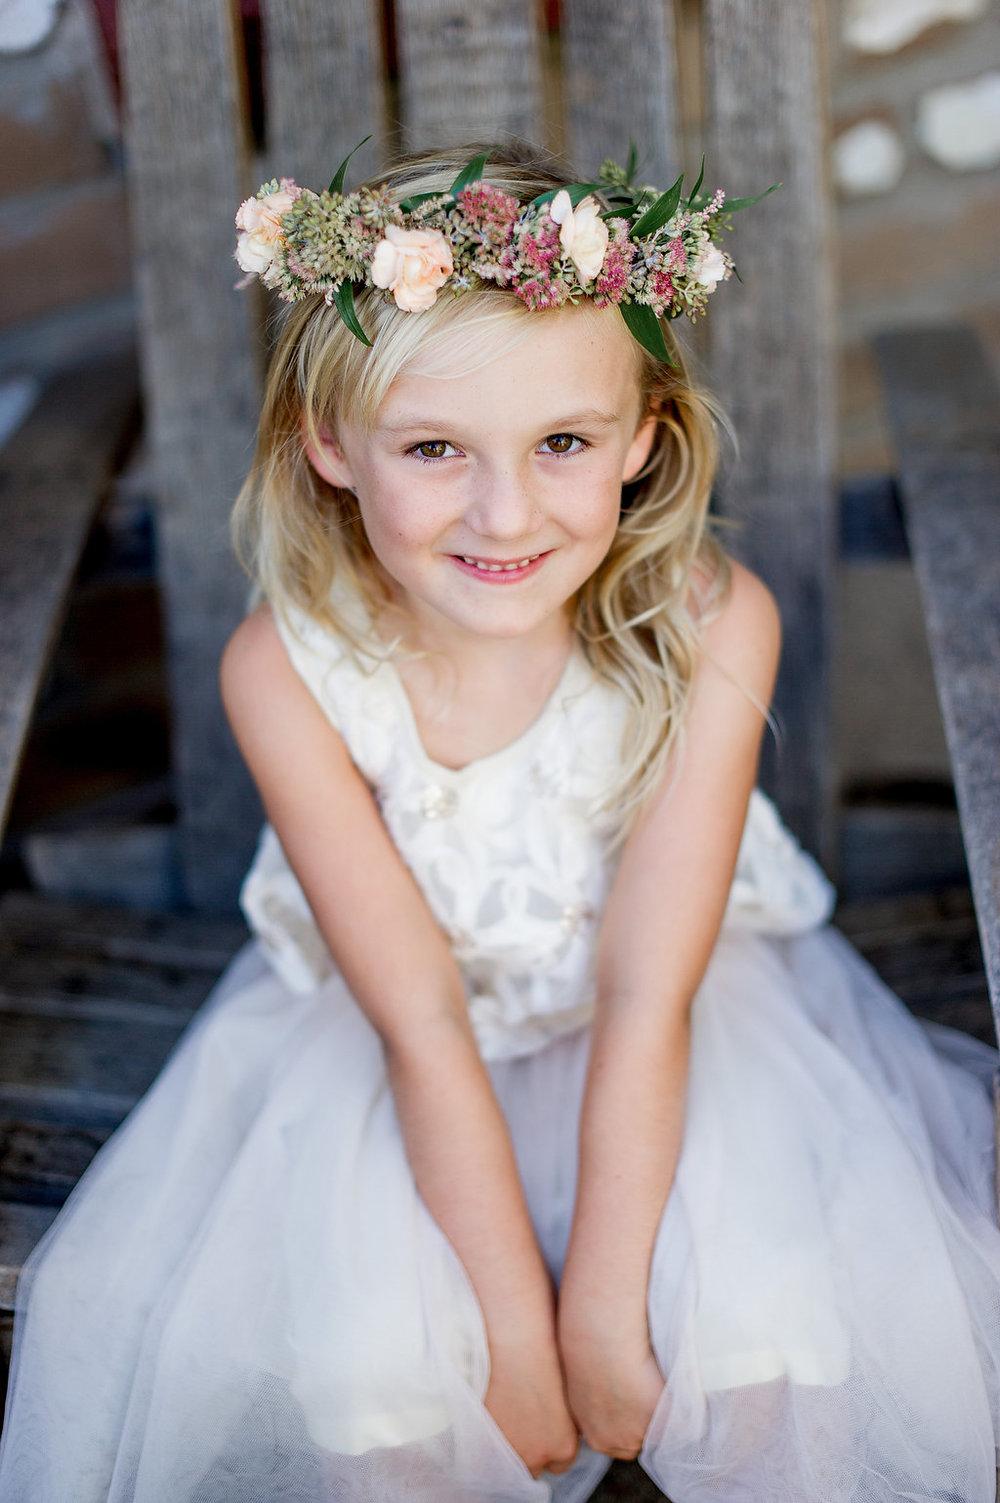 Flower girl crown by Compass Floral | Estancia Hotel & Spa, La Jolla.